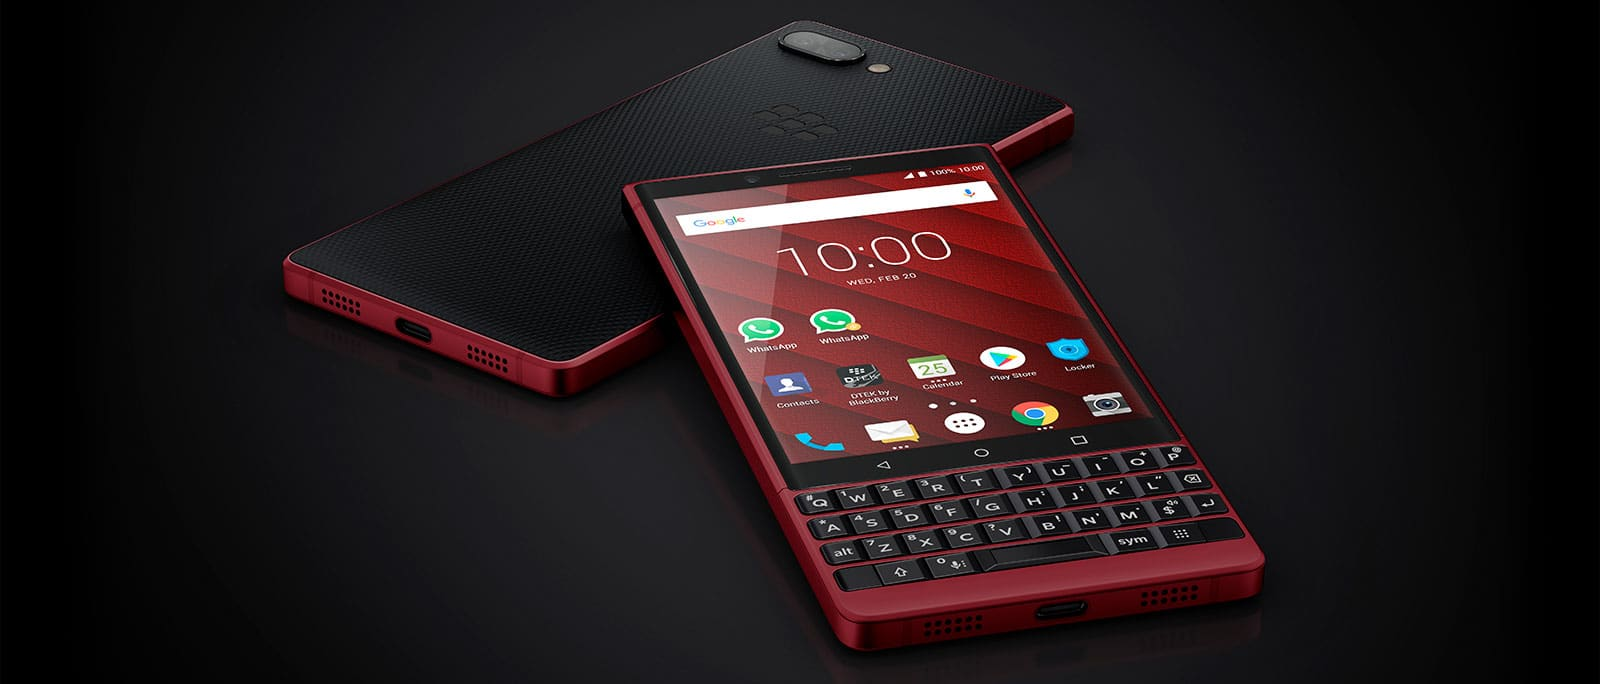 Blackberry News